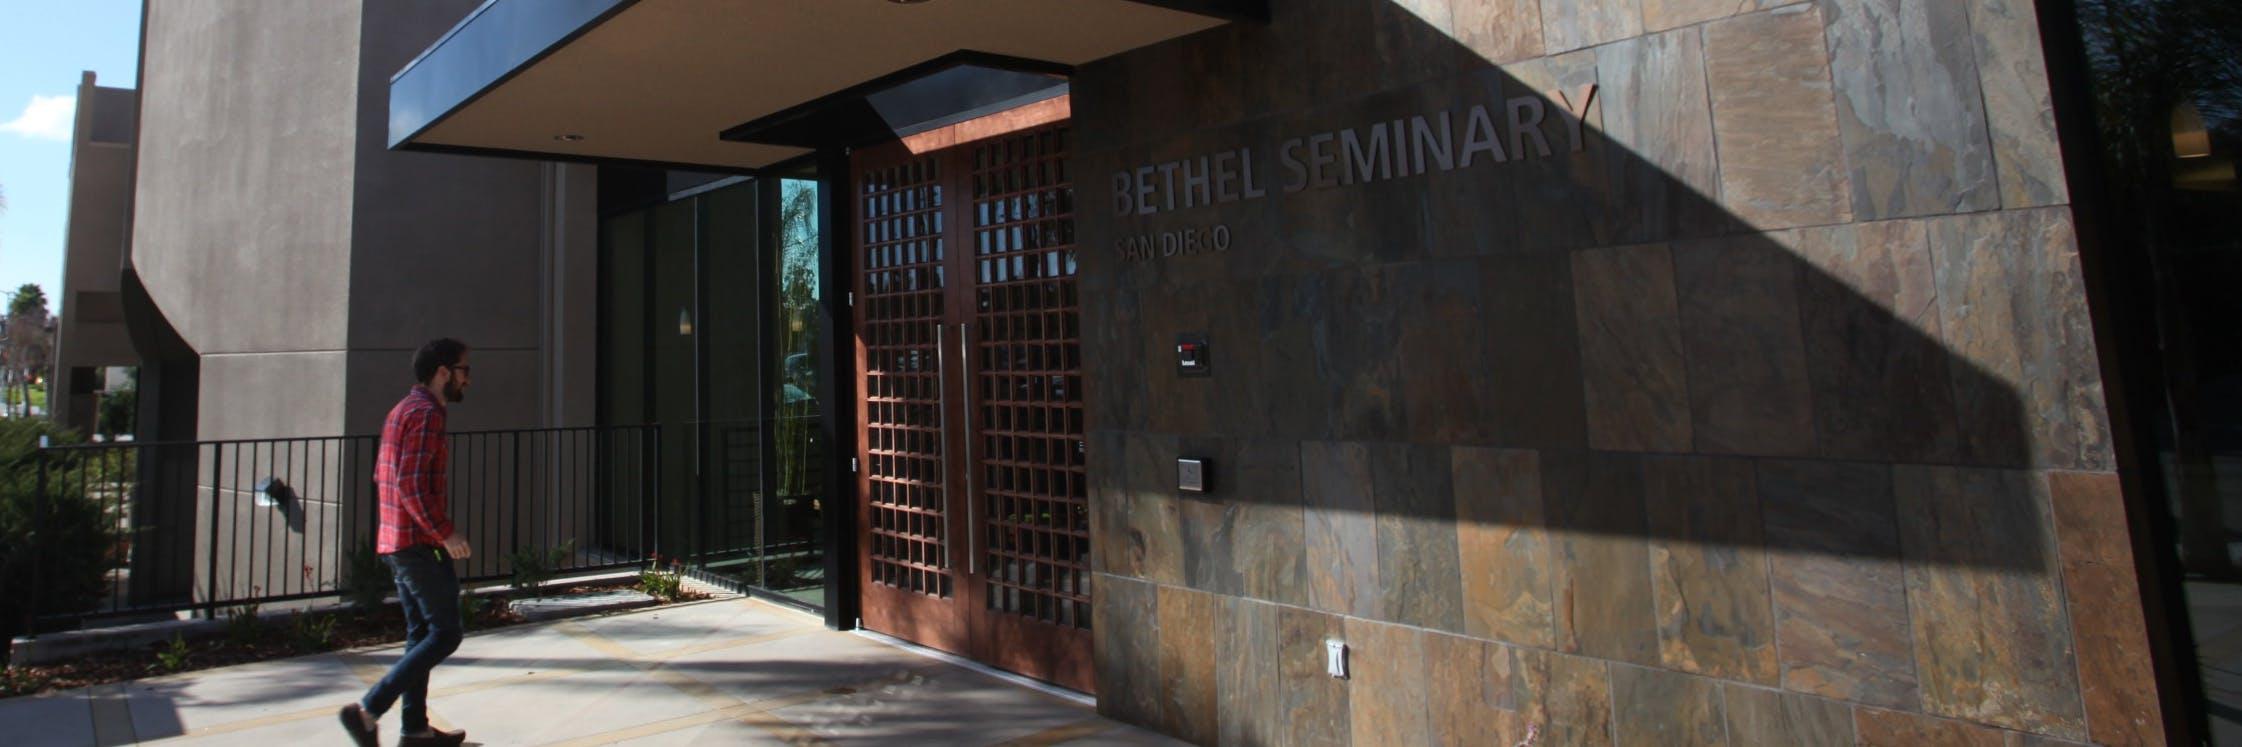 Seminary building in San Diego